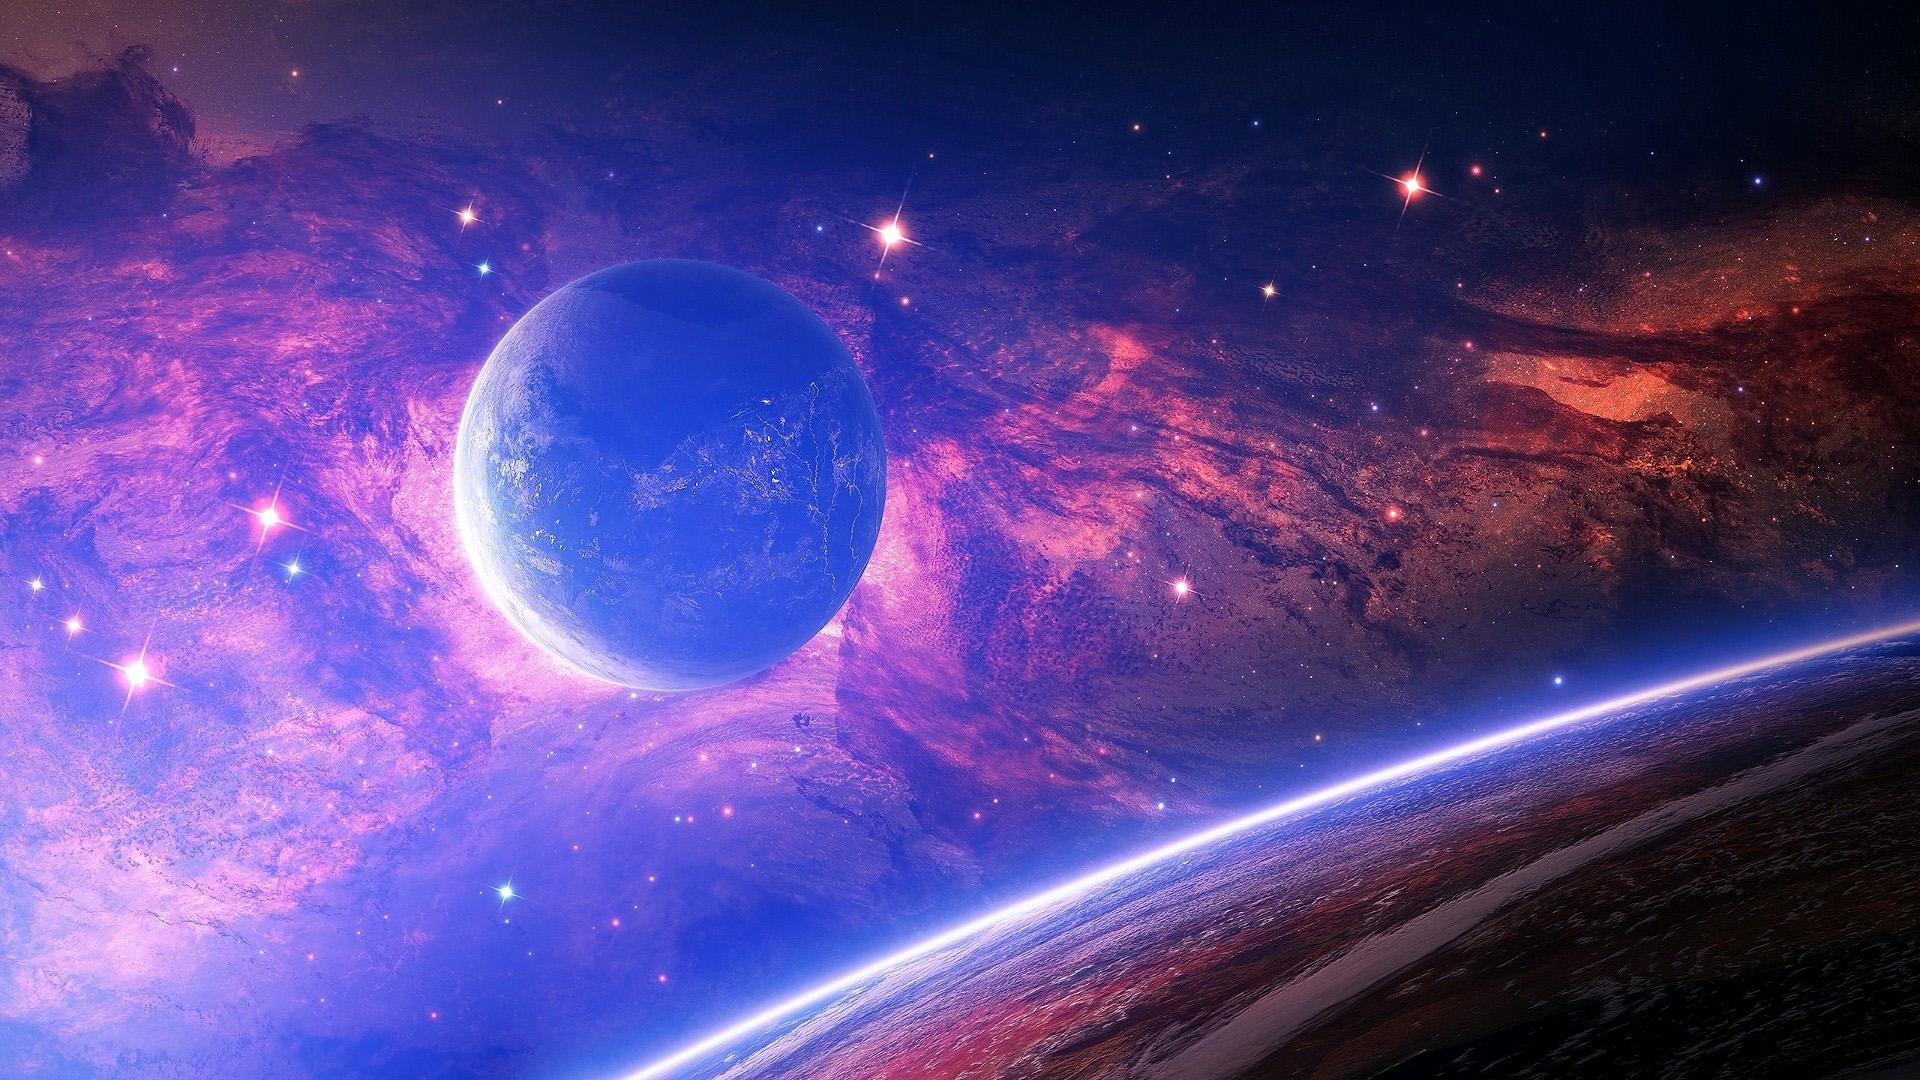 HDoboi.Kiev.ua - Яркая планета в космосе, обои на айфон 5 космос, галактика